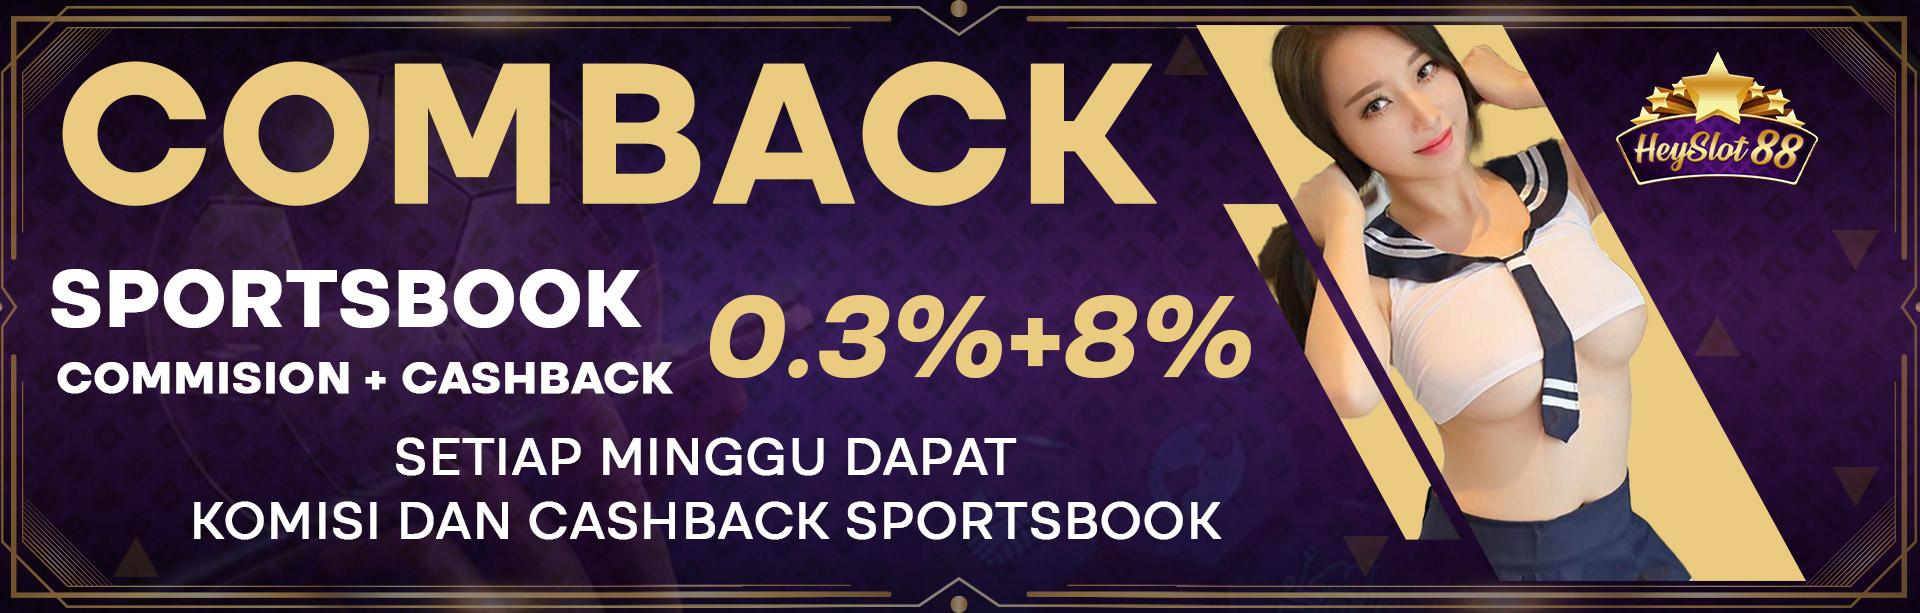 Bonus Komisi + Cashback Sportsbook 0.3% + 8%